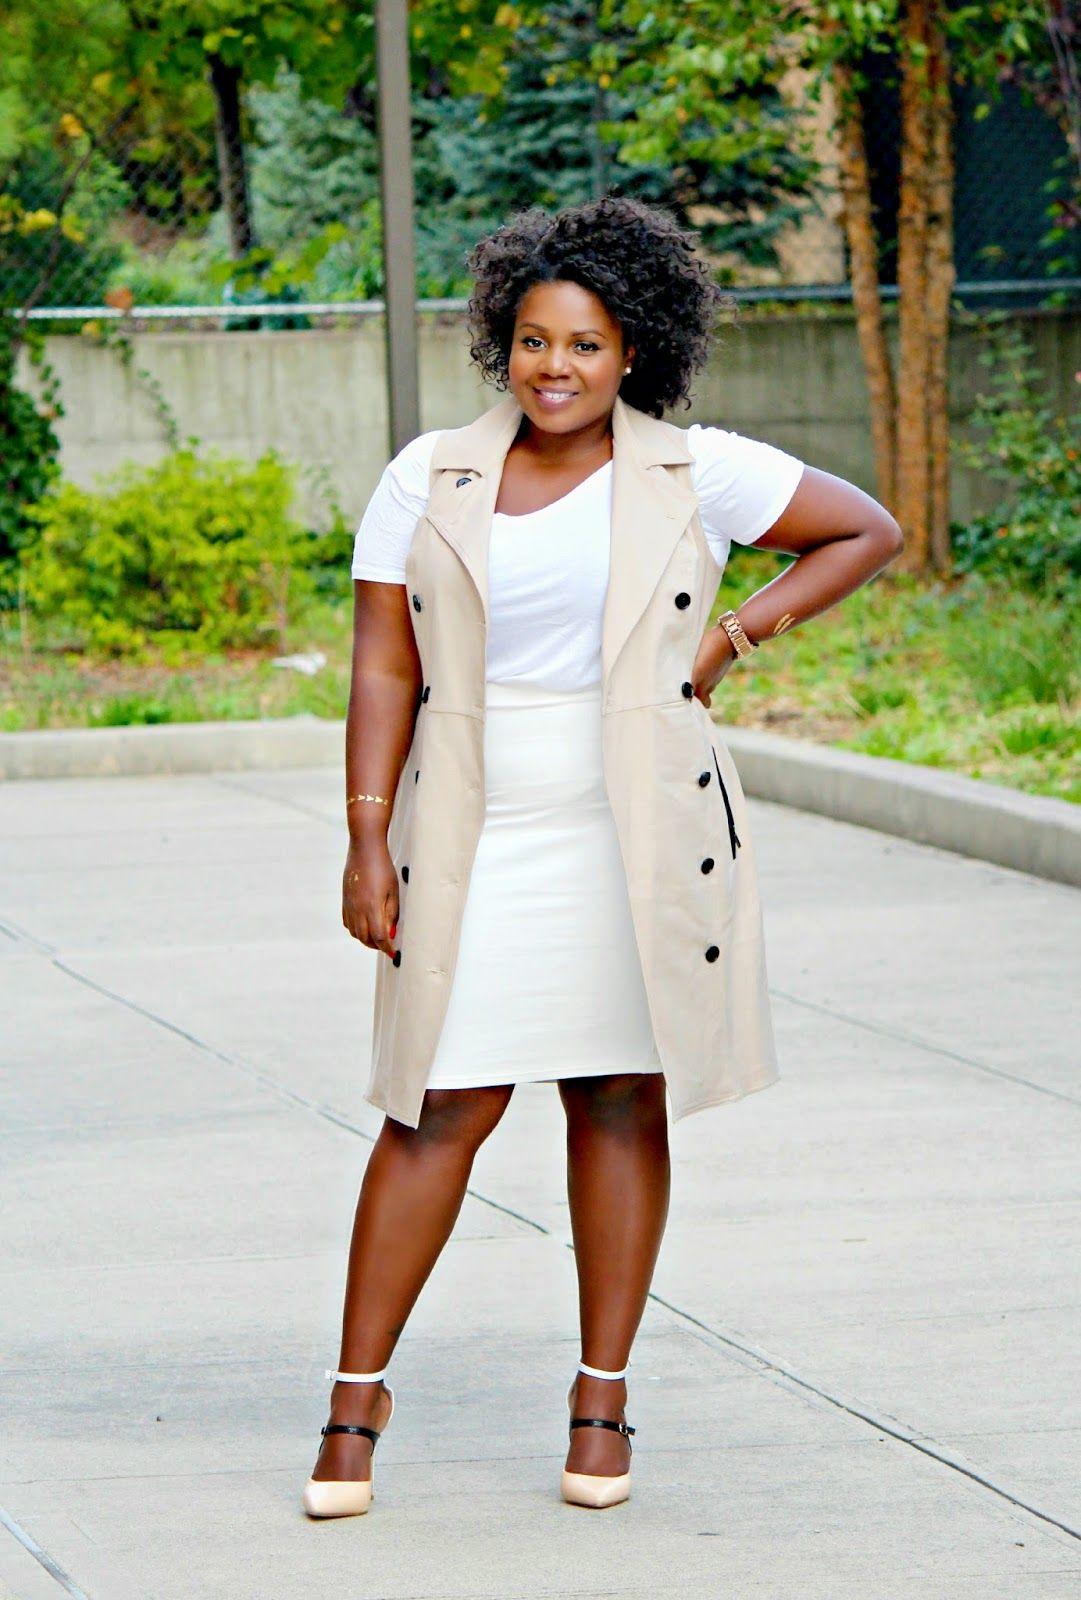 ann taylor trench dress | phat fashion bbw | pinterest | trench